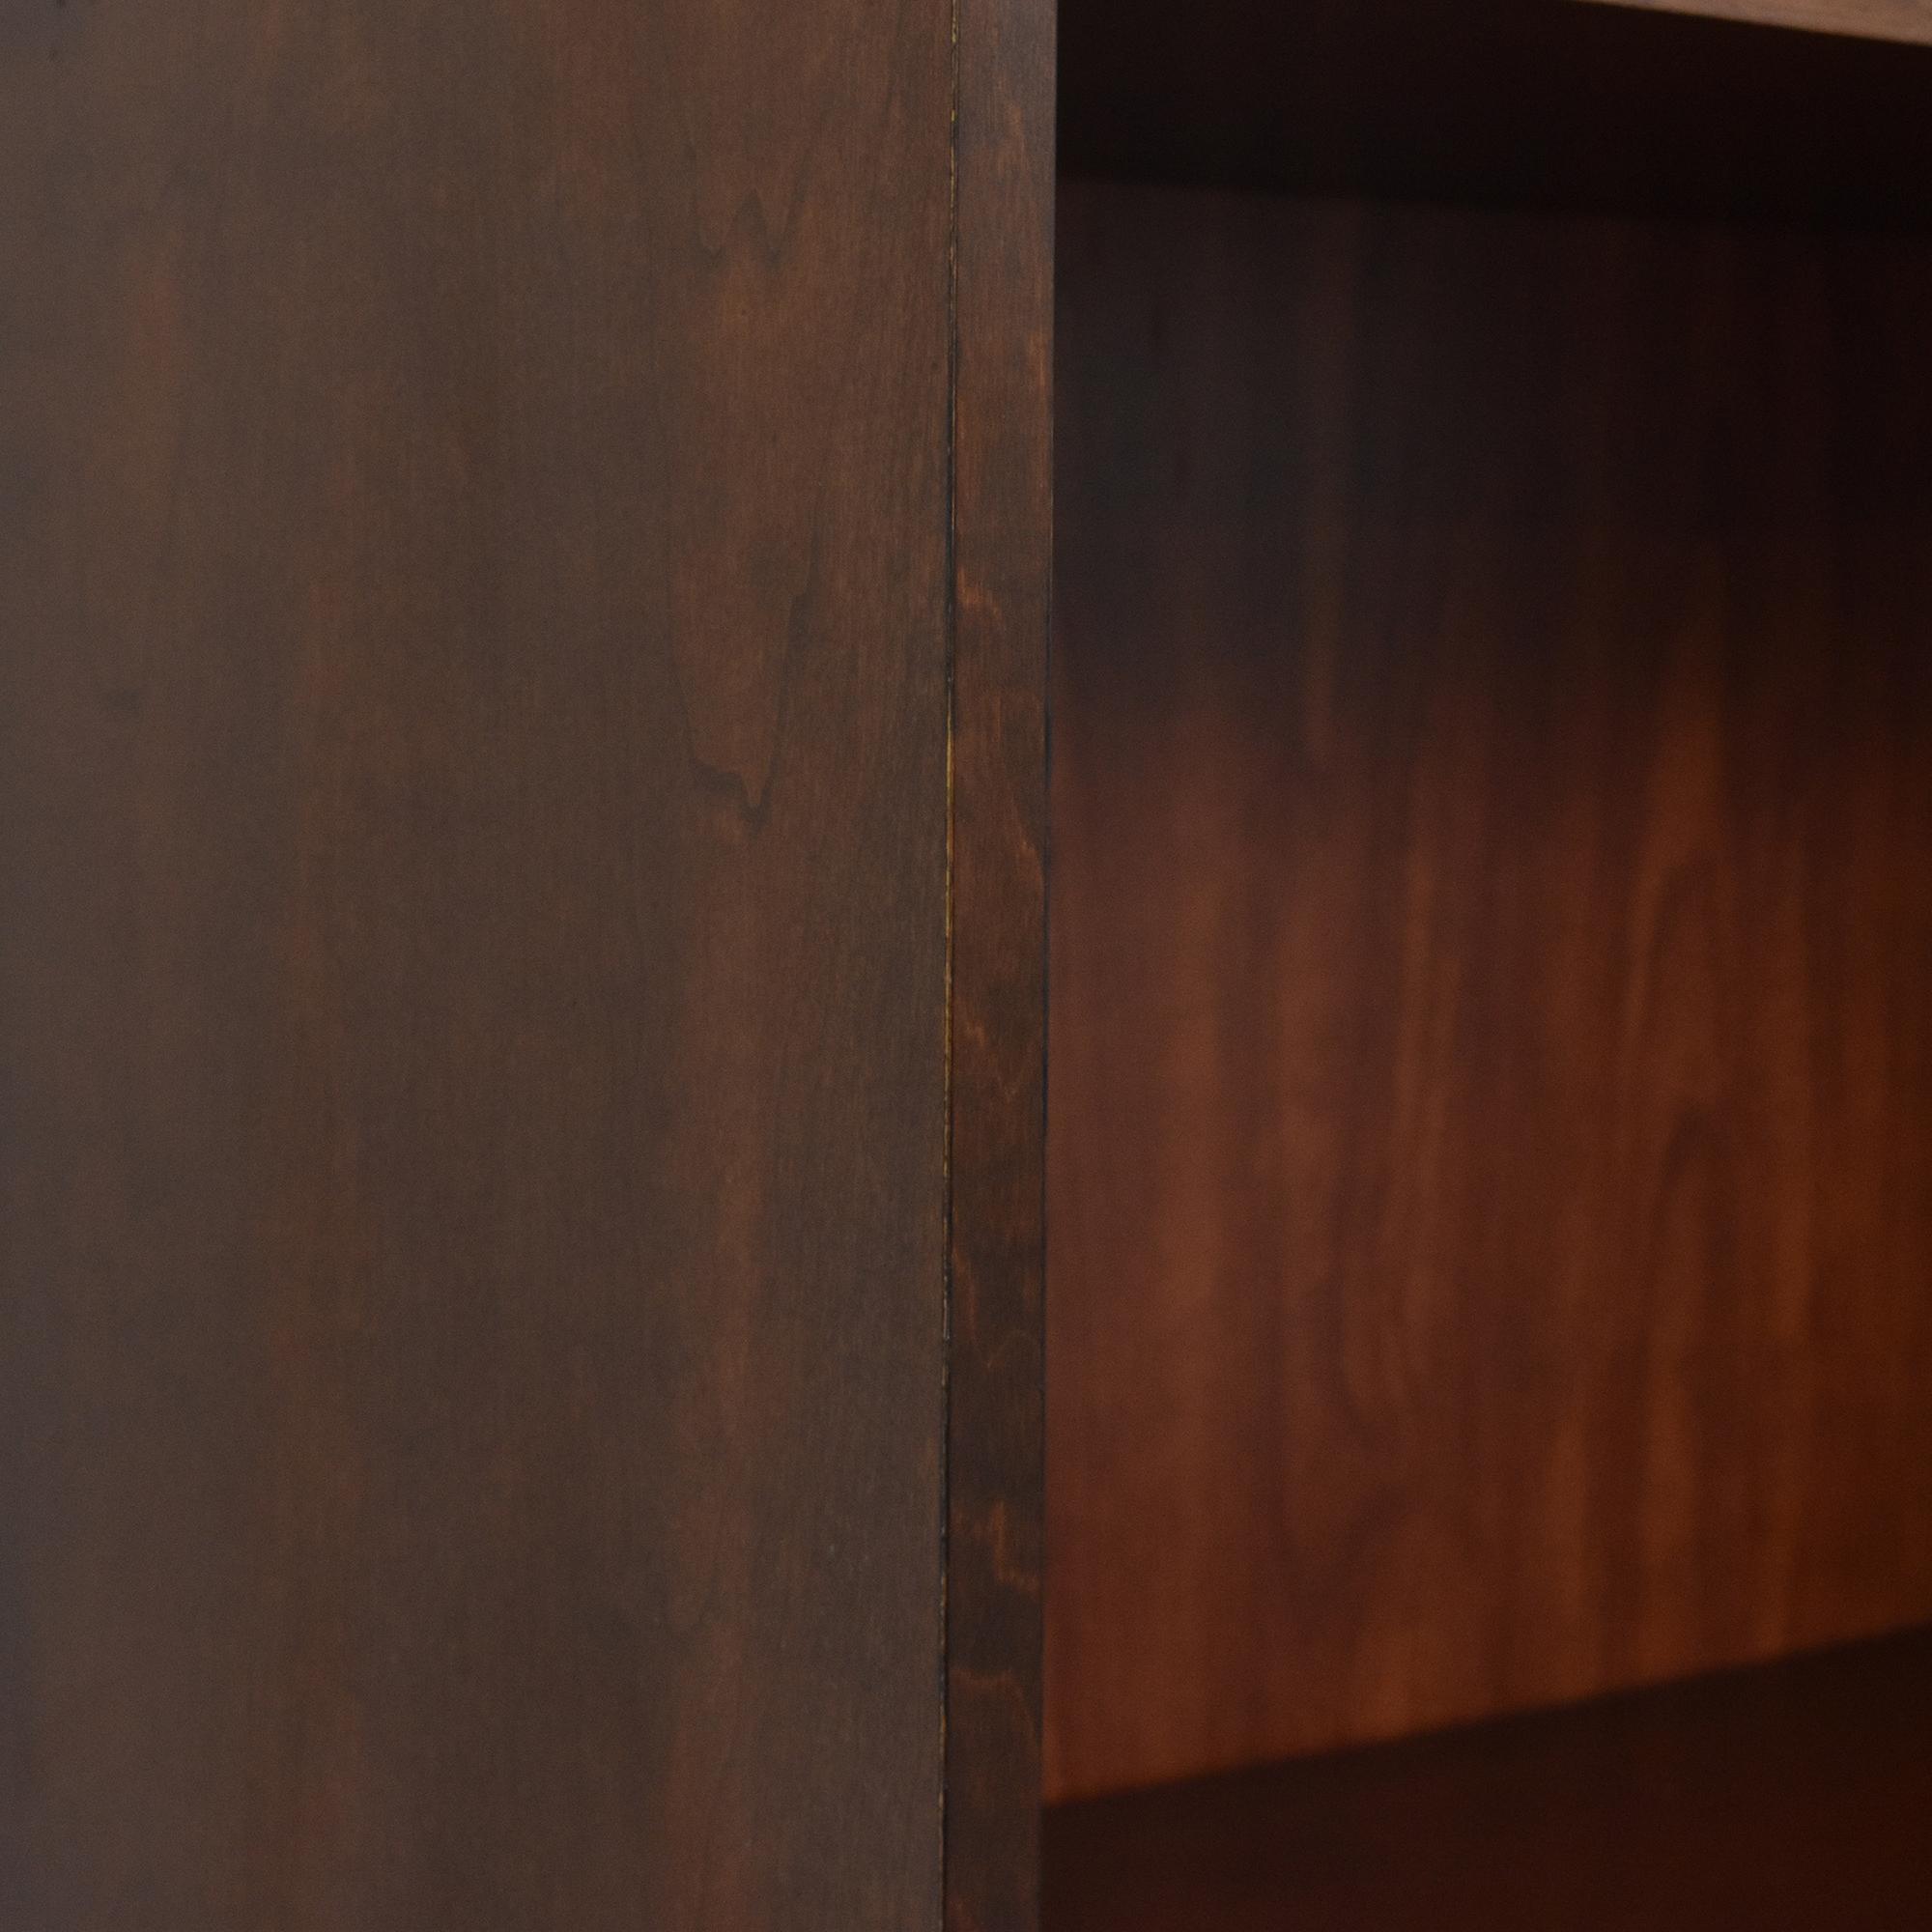 Hooker Furniture Hooker Furniture Tall Bookcase pa